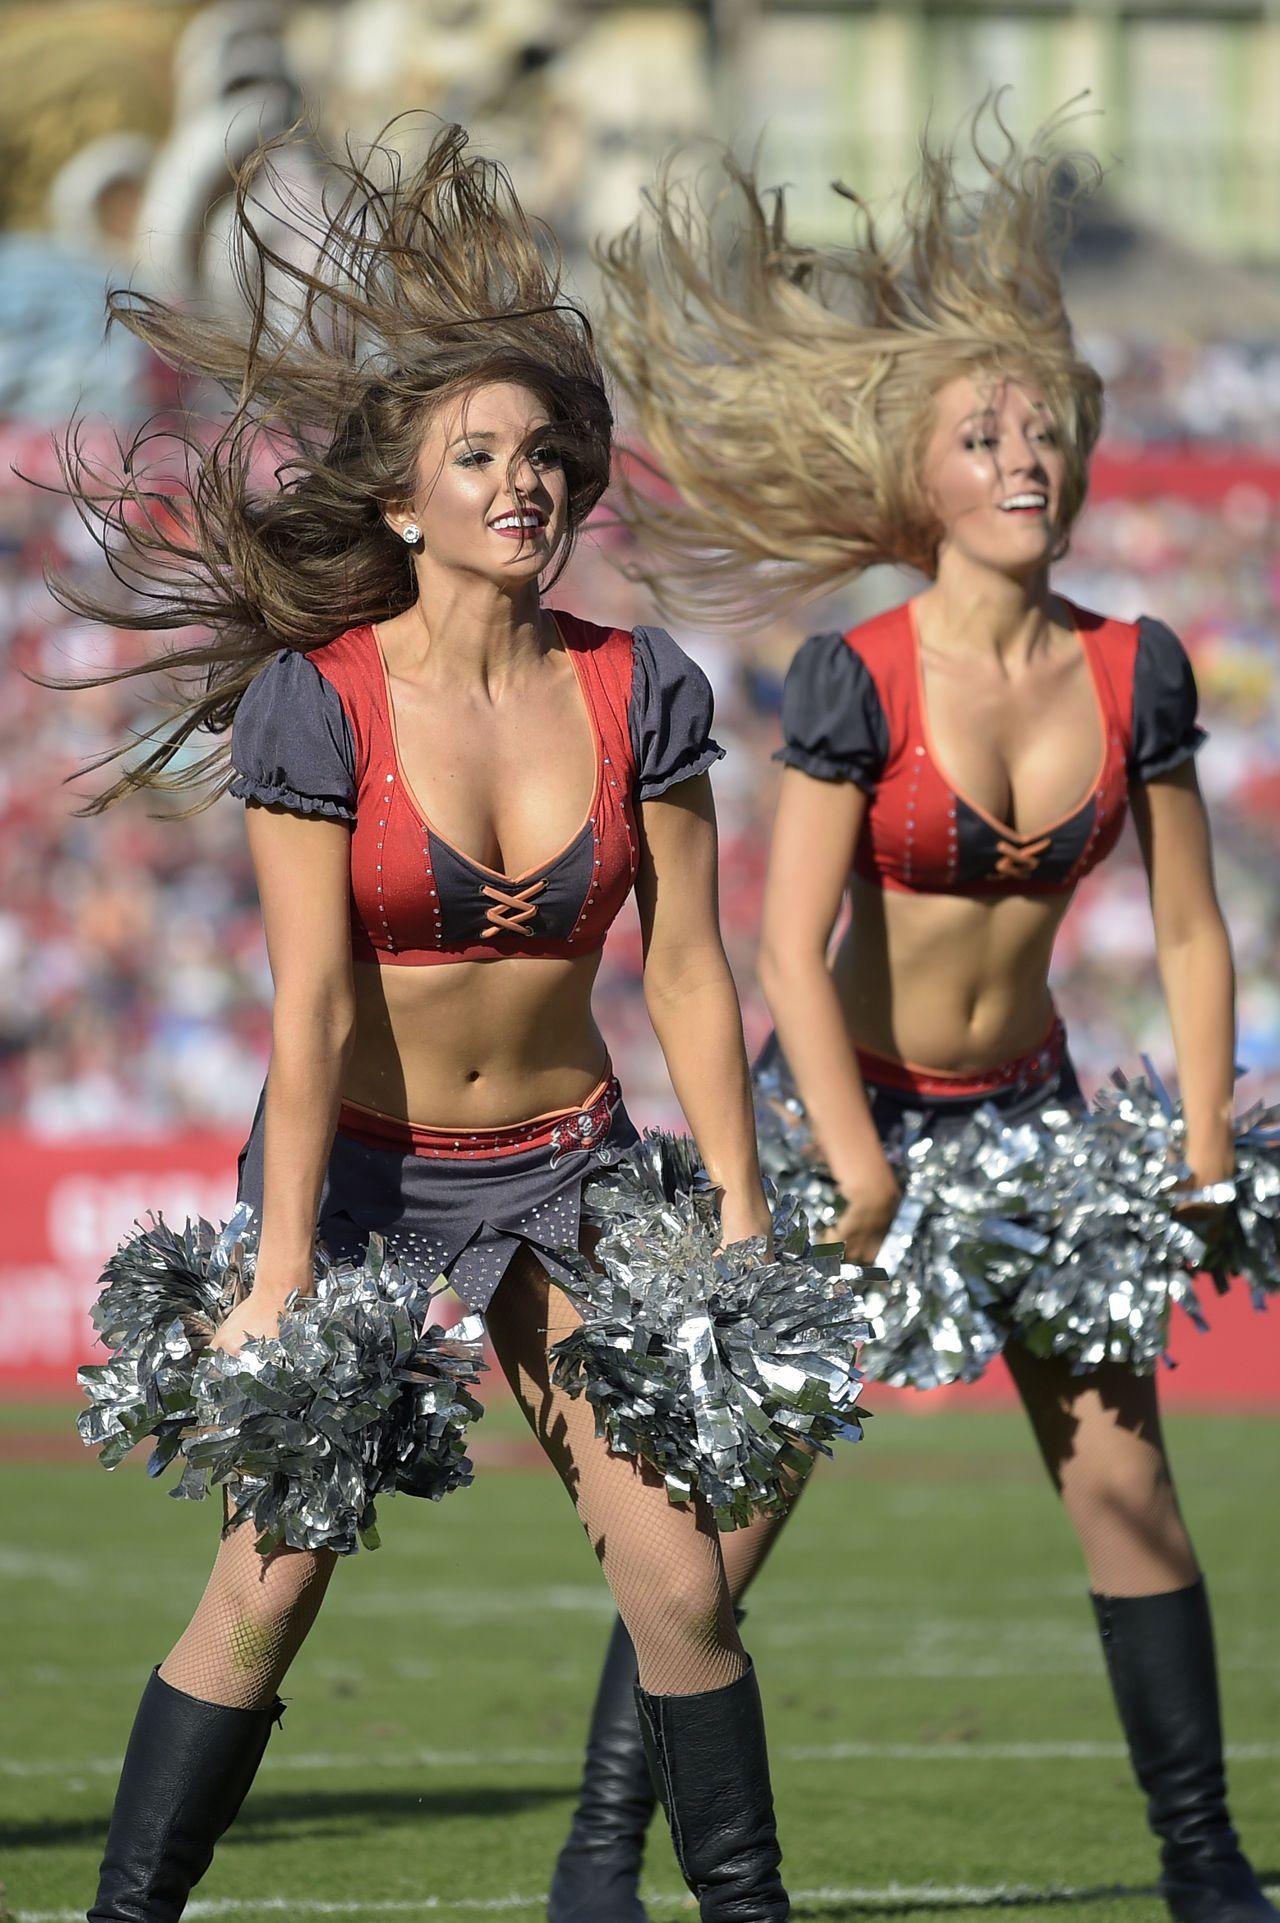 Tampa bay buccaneers cheerleader tricia